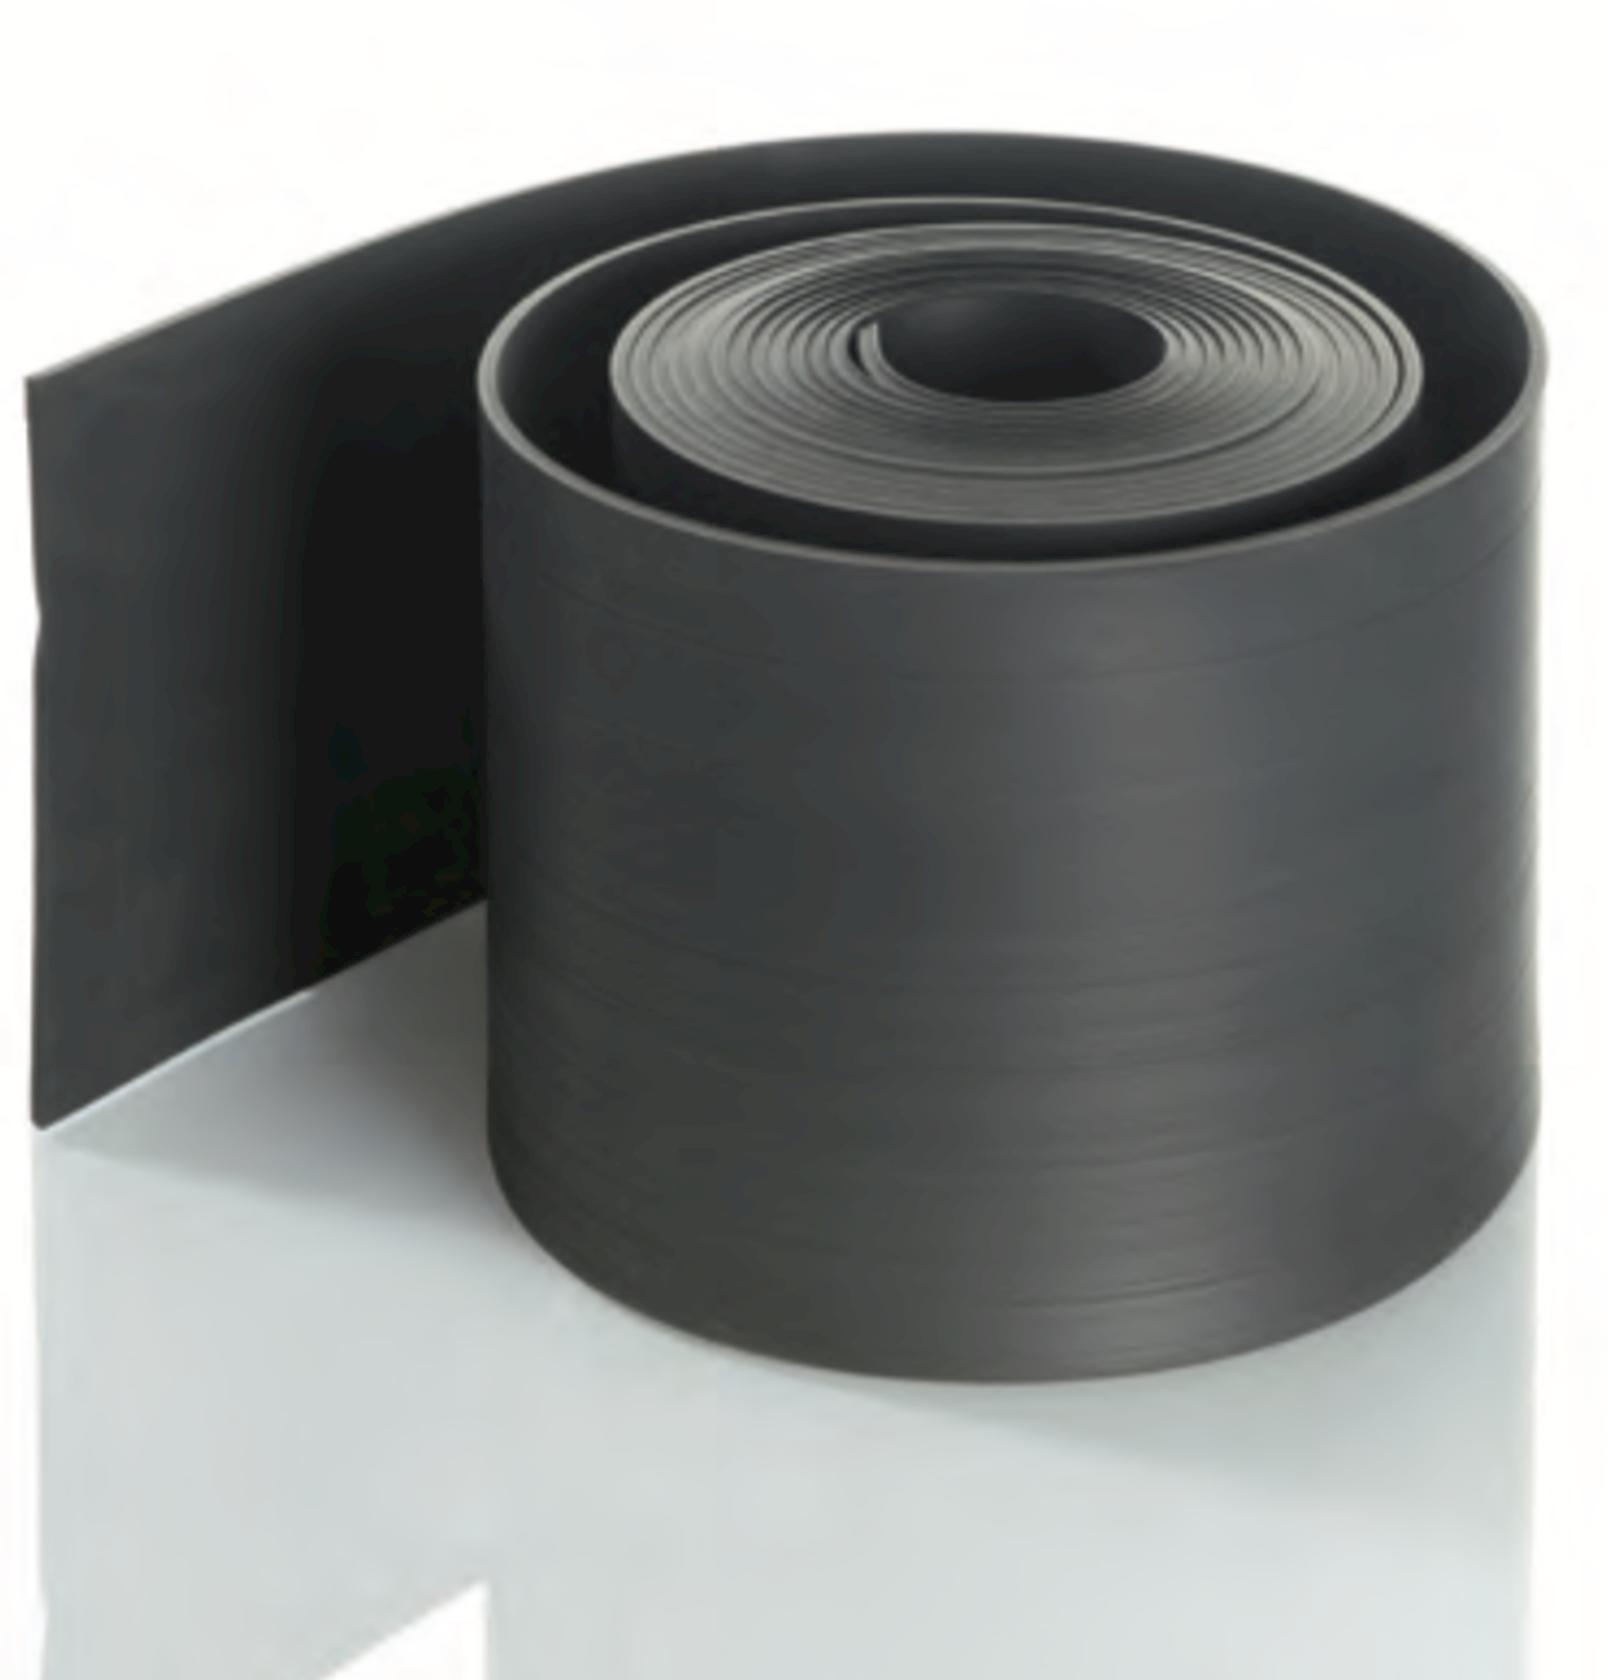 Ecorub afboording H13cm - L15m